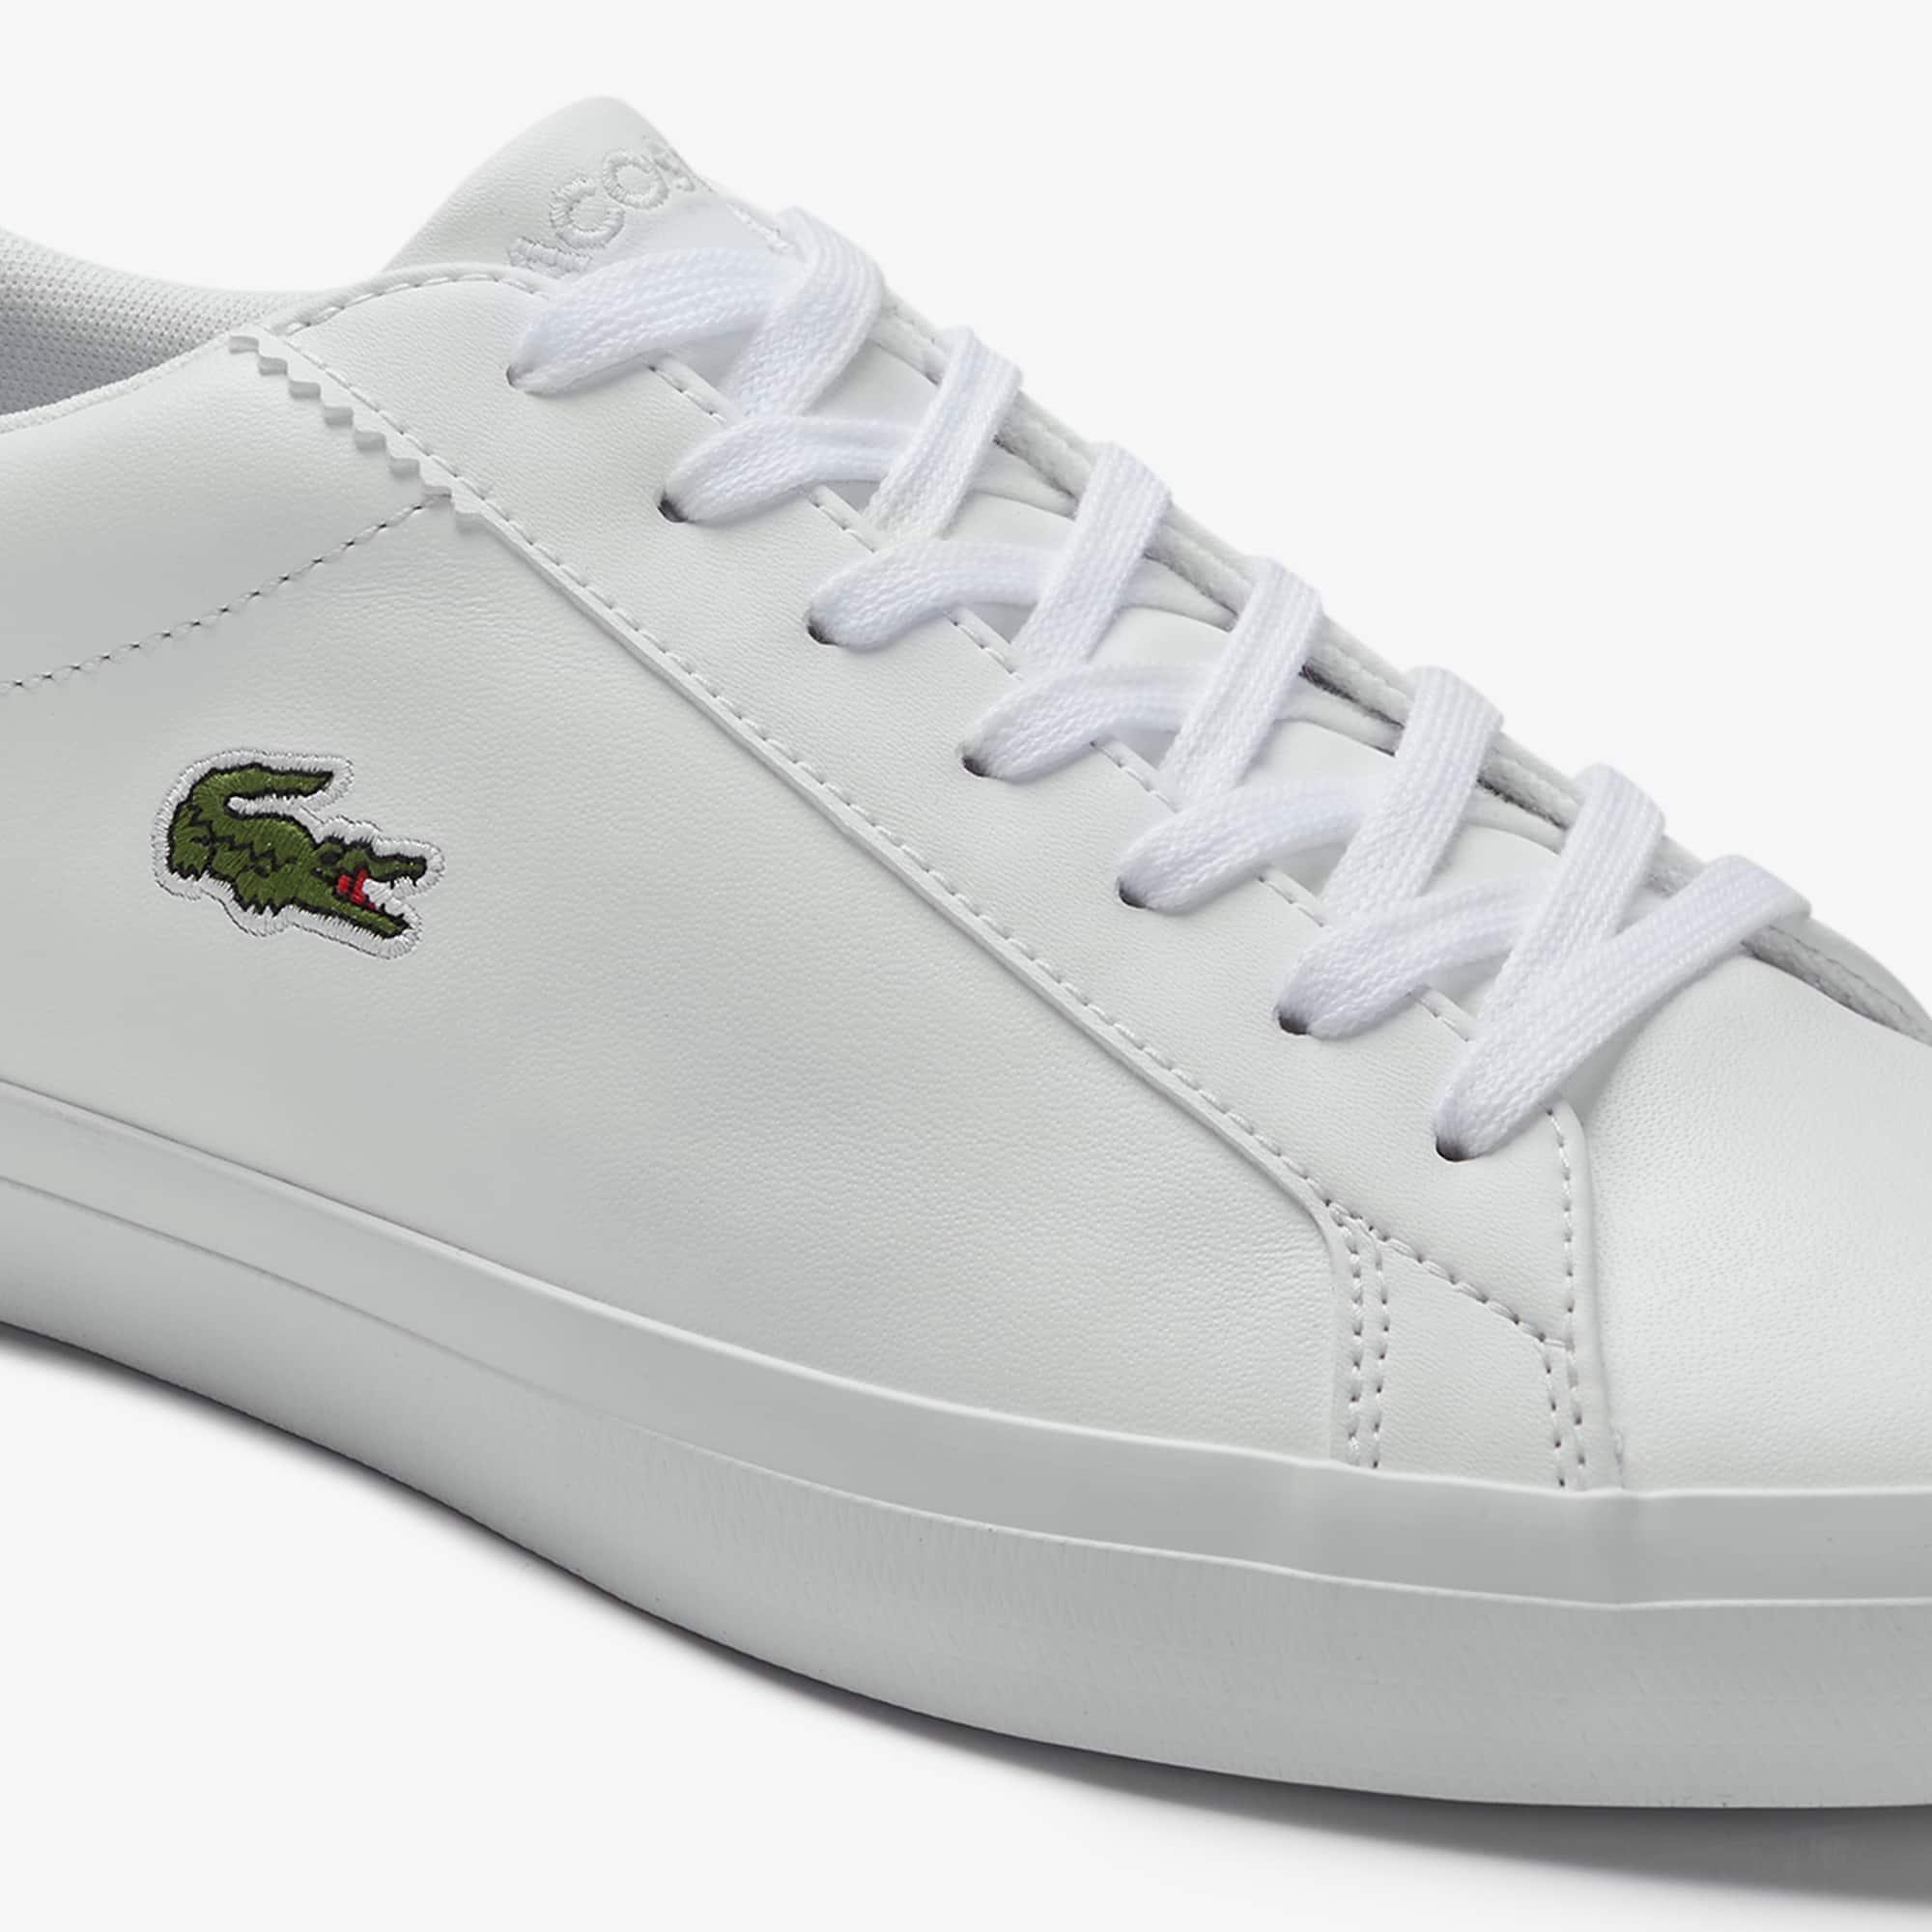 Lacoste - Herren-Sneakers LEROND aus einfarbigem Leder - 6